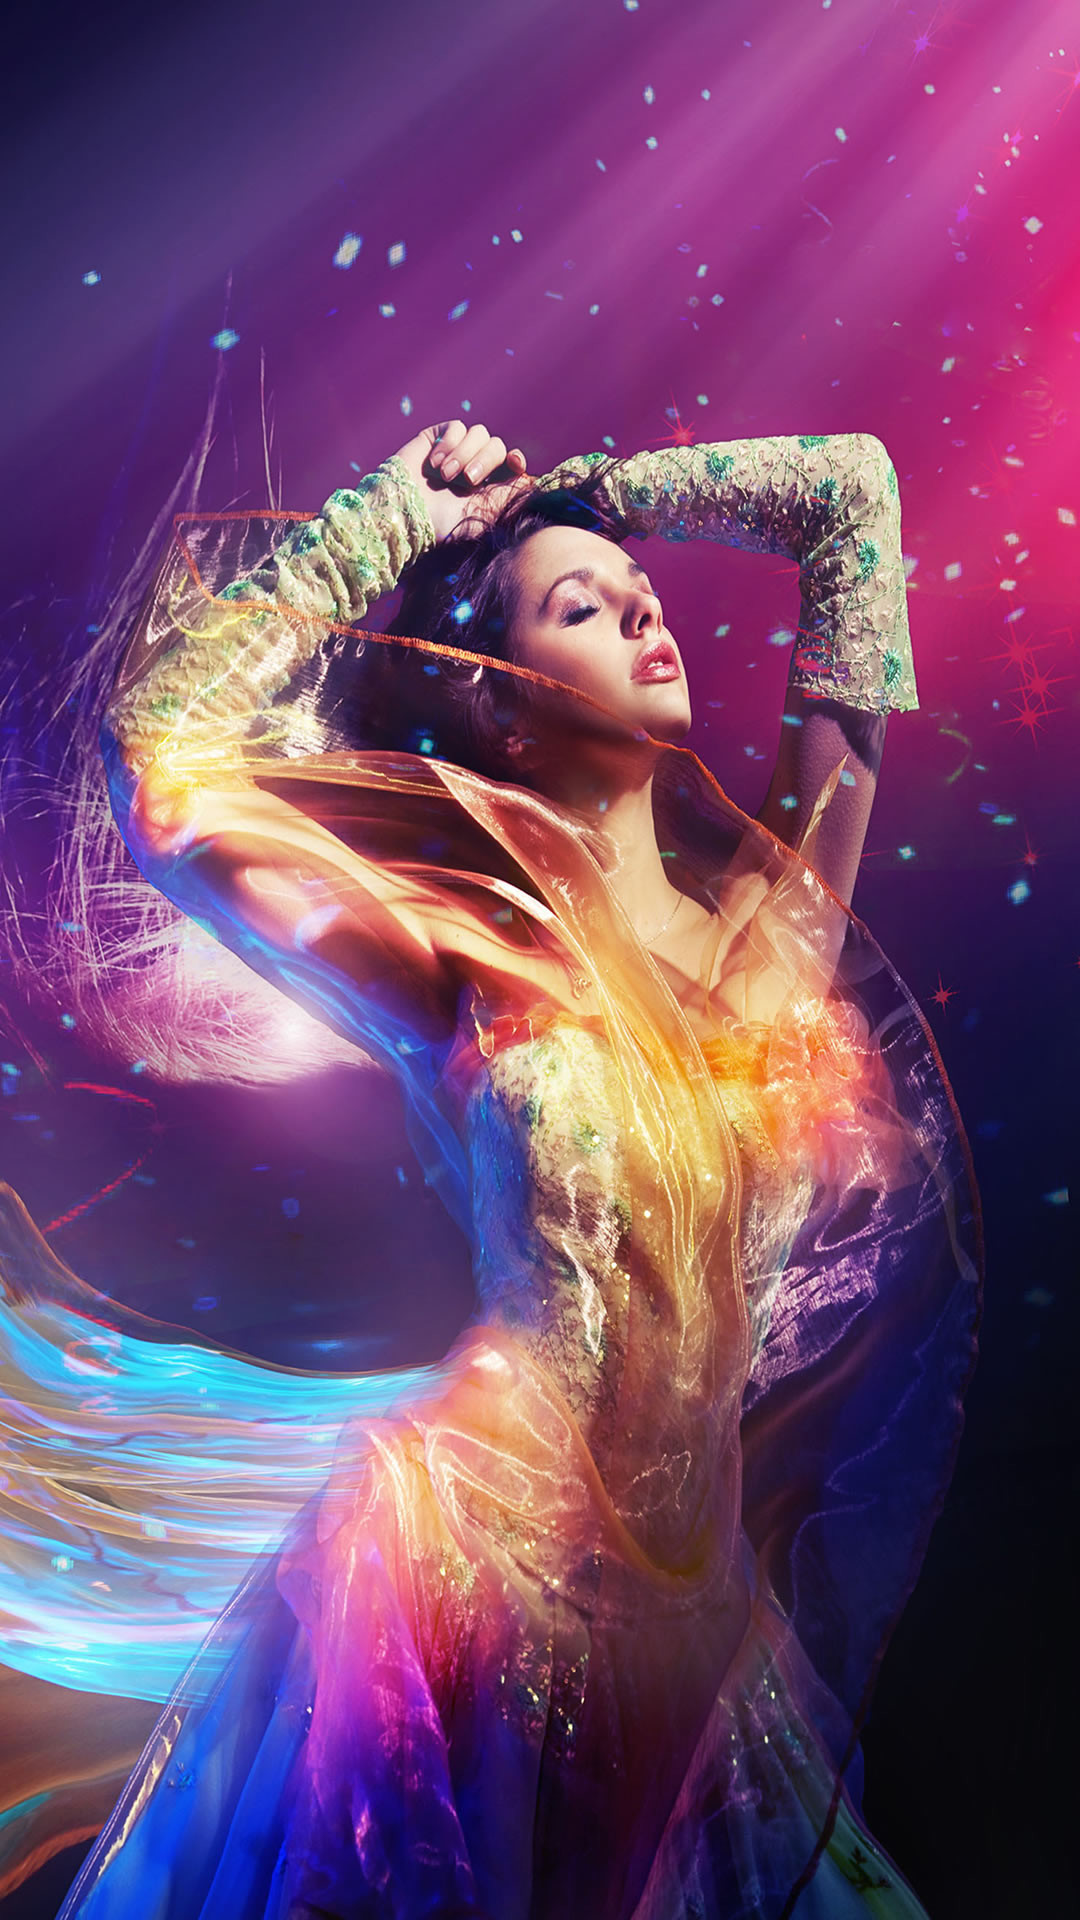 Color Fantasy Girl #iPhone #7 #wallpaper